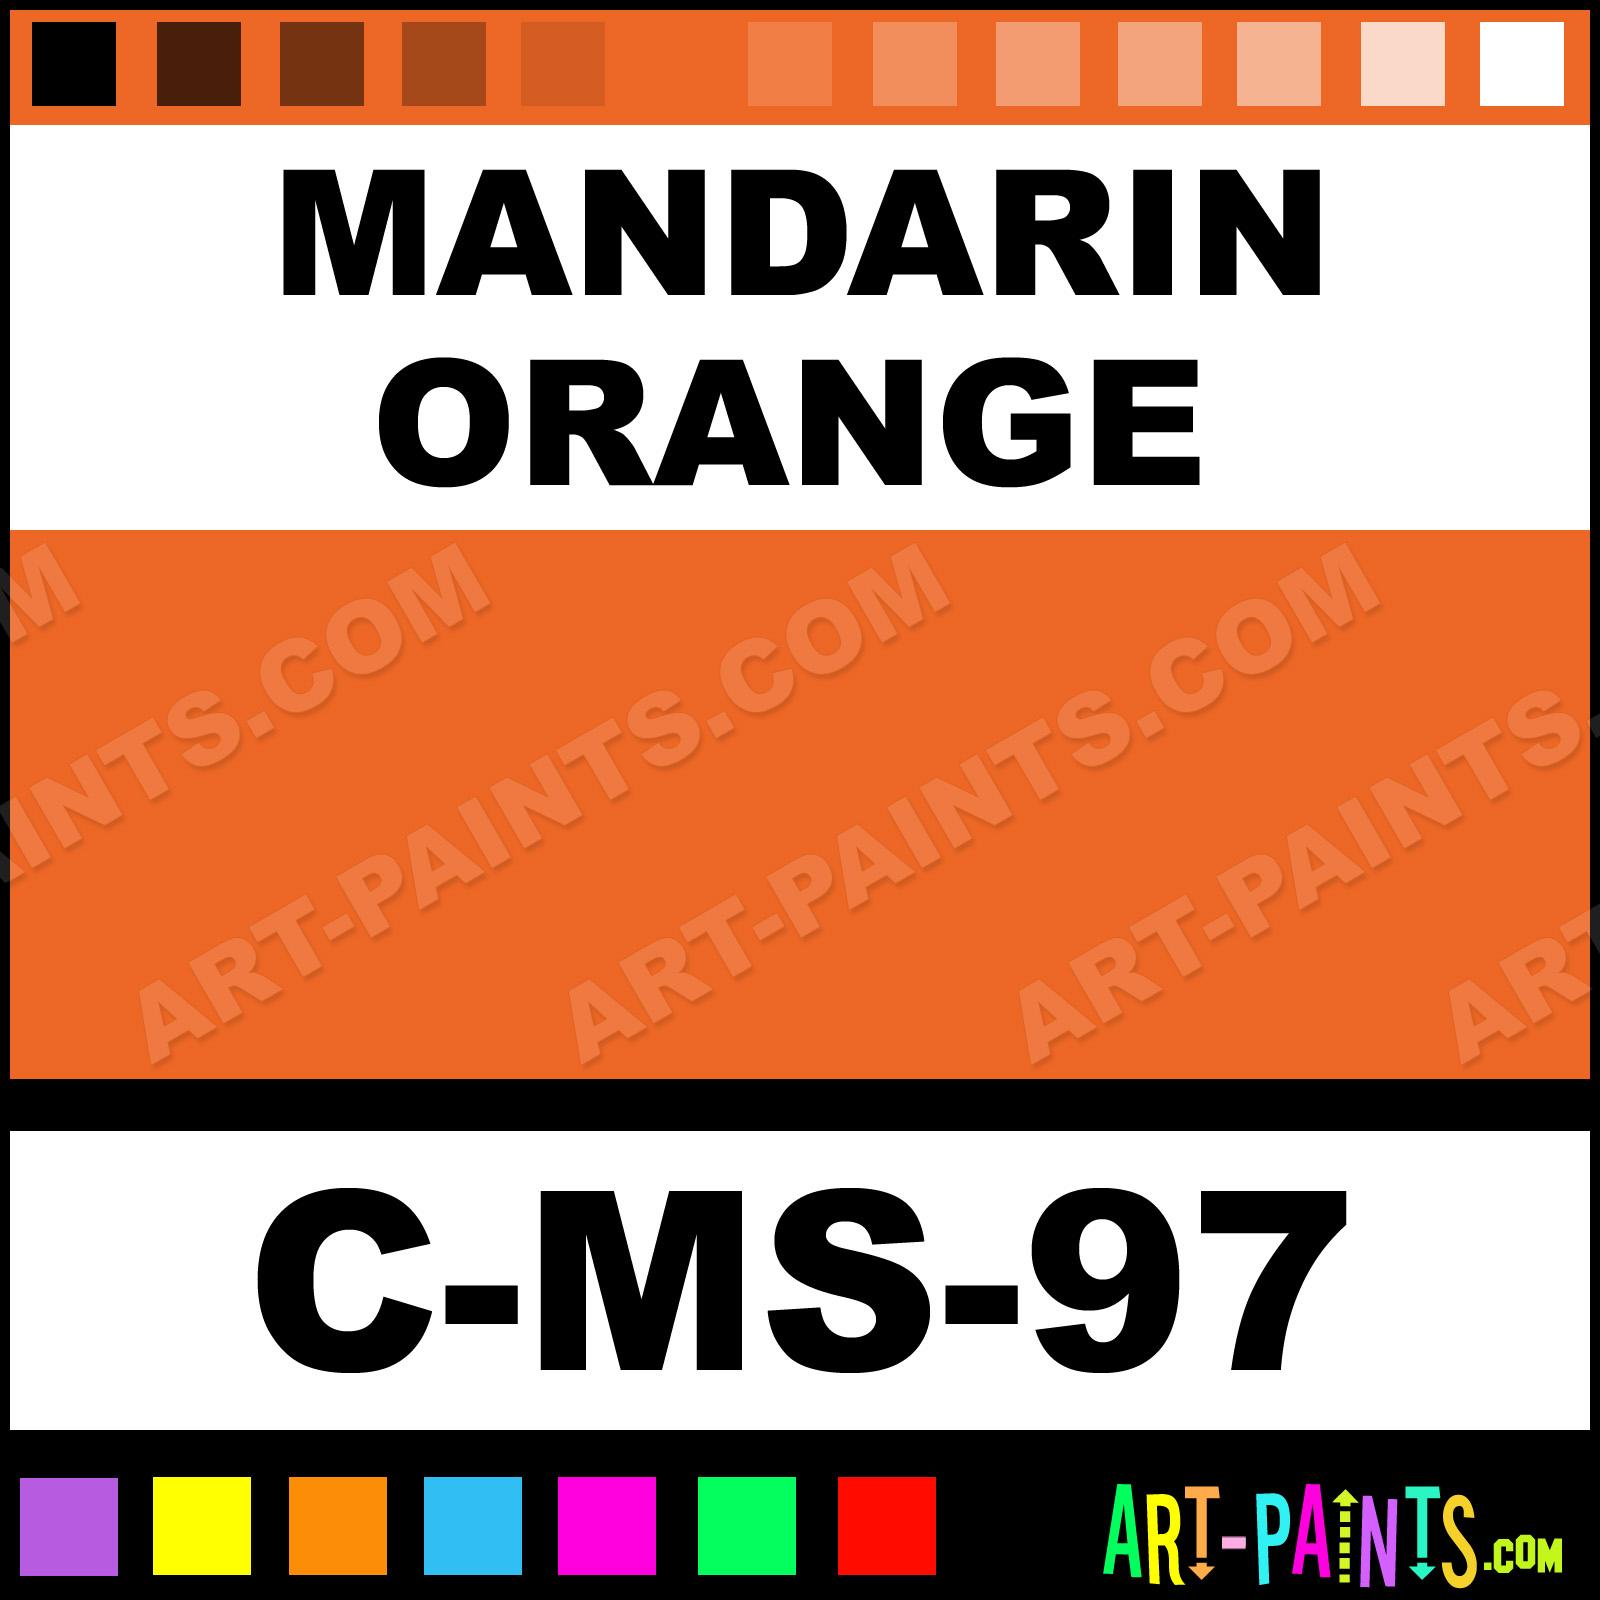 Mandarin Orange Paint